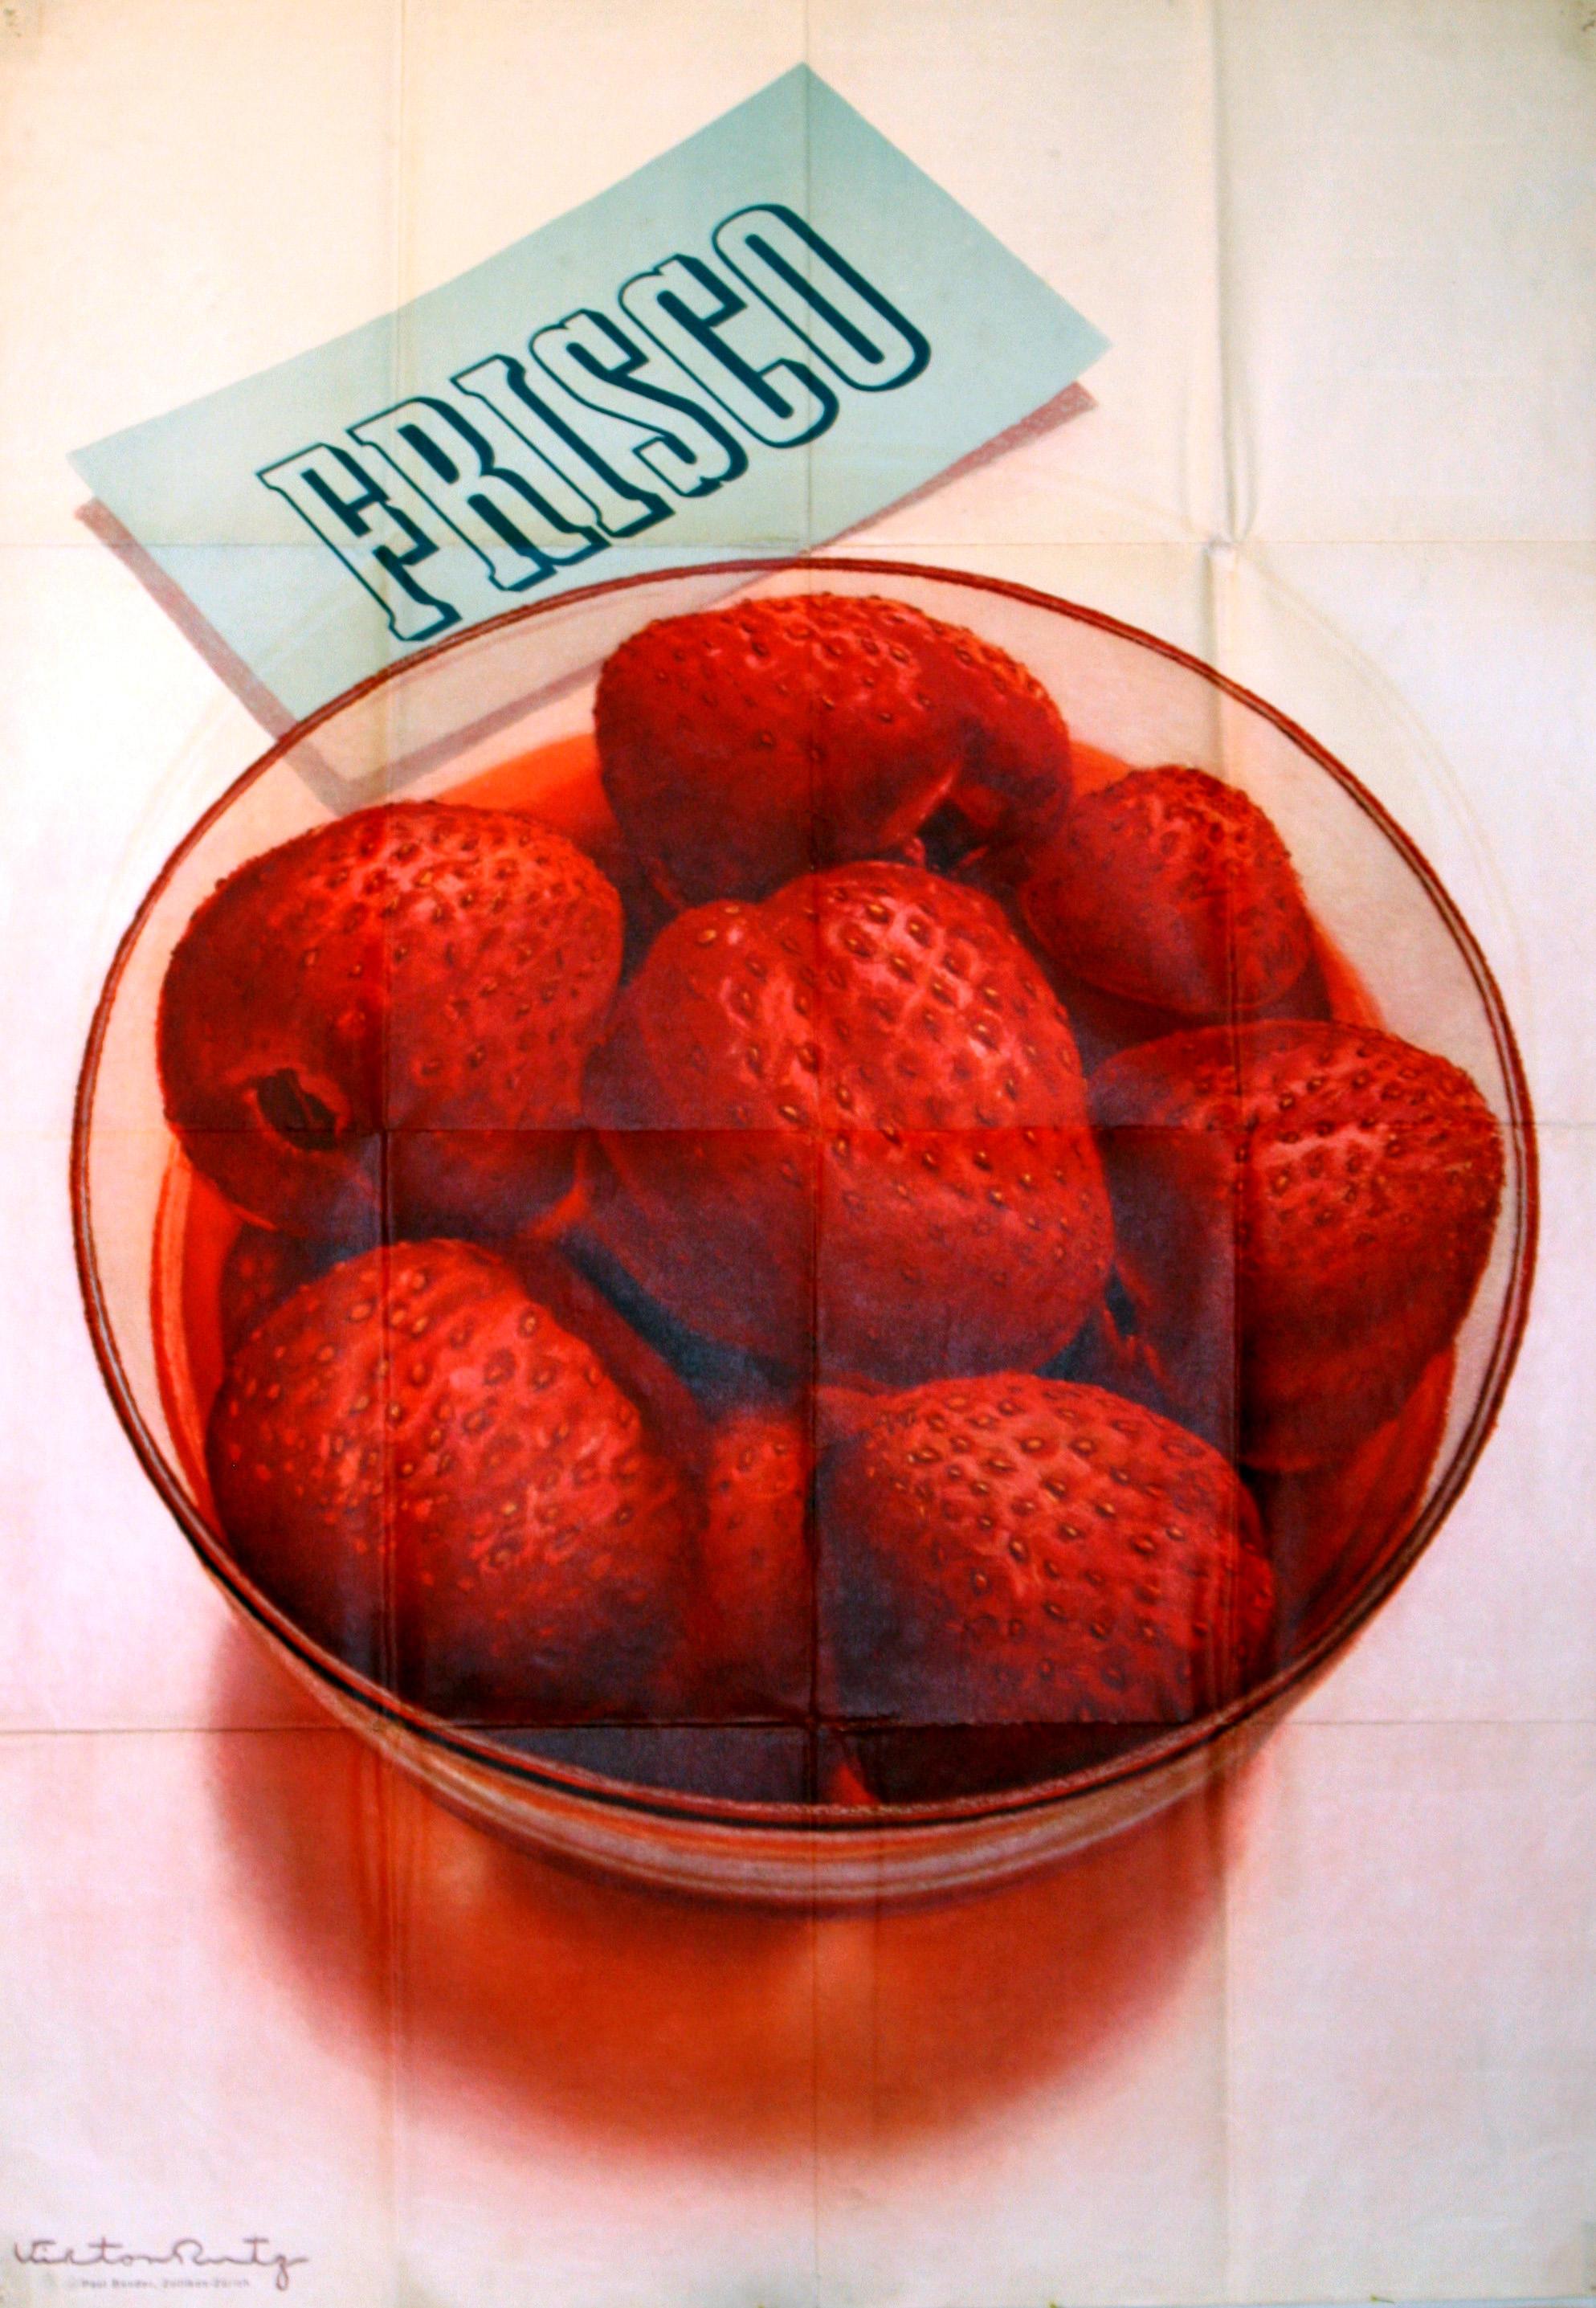 Lot 1408 - Original 1942 advertising poster Frisco strawberries Swiss